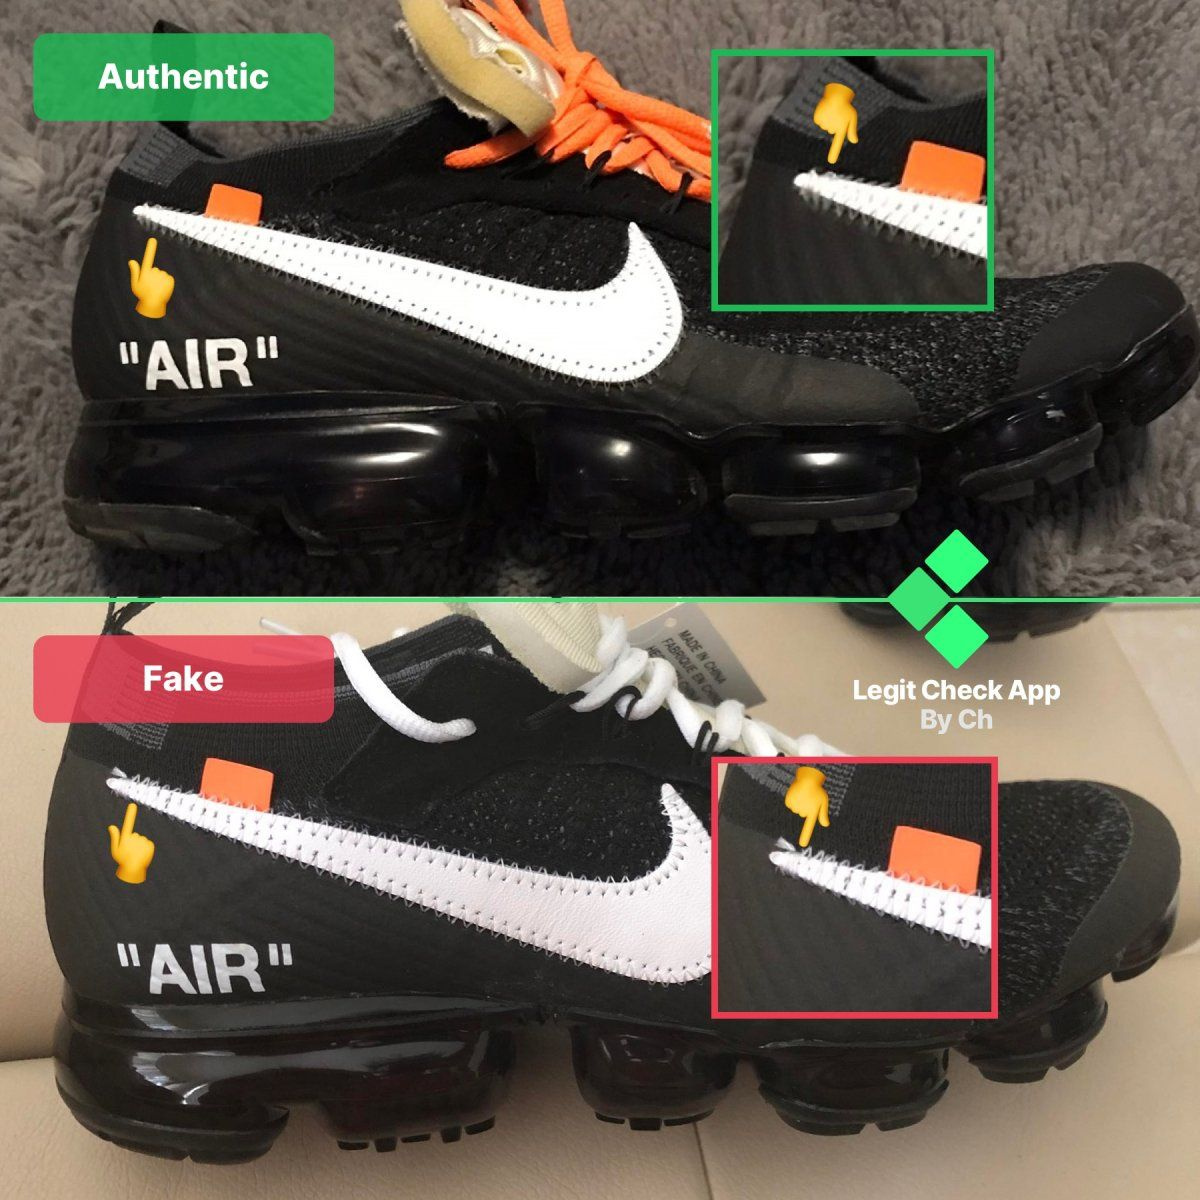 Zanahoria Calibre Tacón  Step 2: Verify the Nike Swoosh logo on your sneakers in 2020 | Nike swoosh  logo, White nikes, Off white shoes